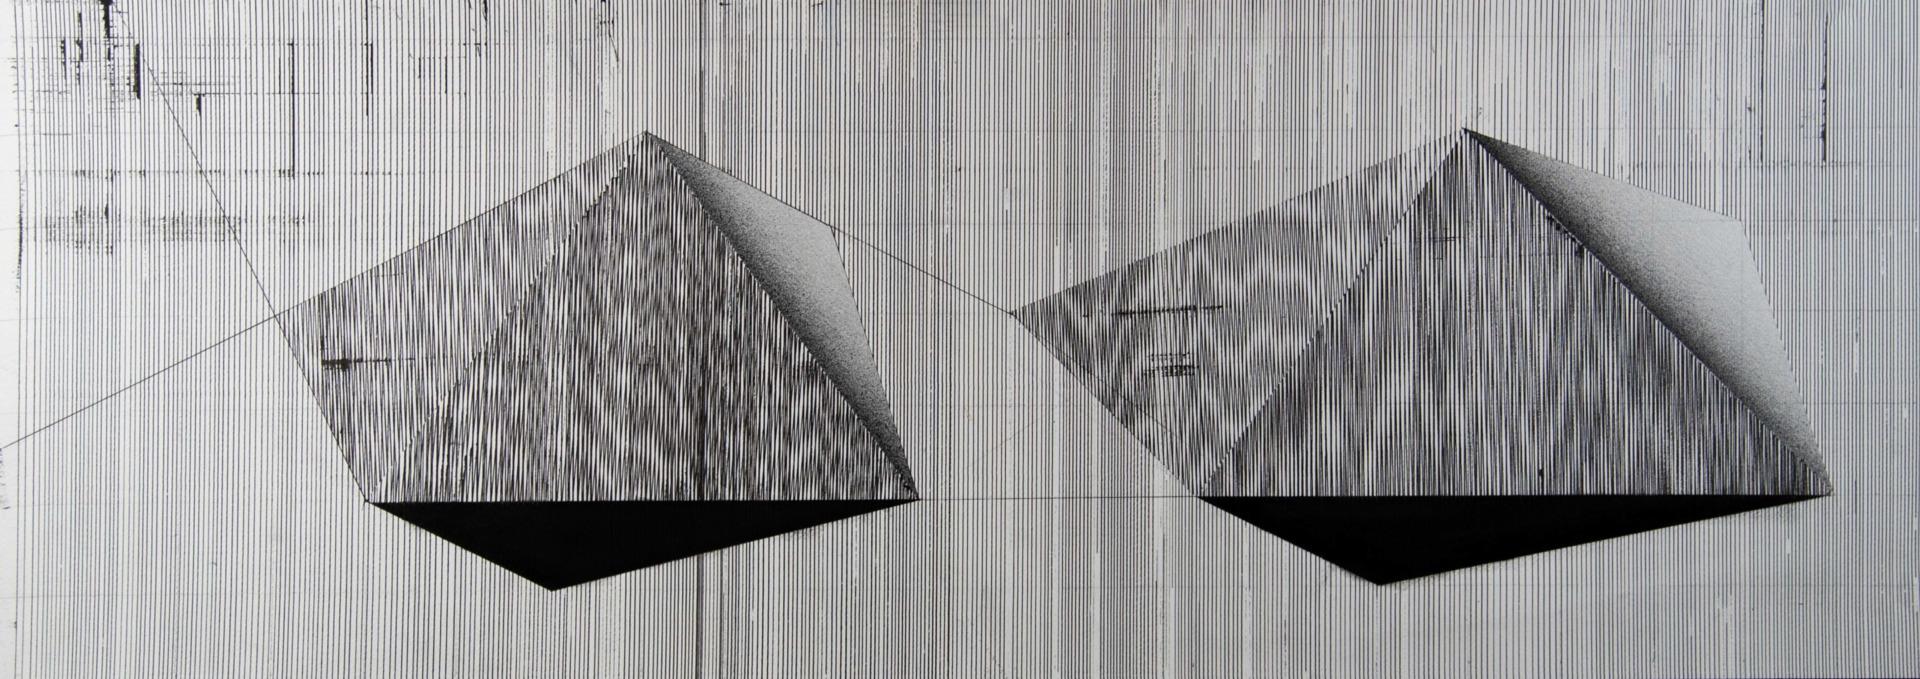 Contemporary art from Gyula Sági | Op. 250121. 4